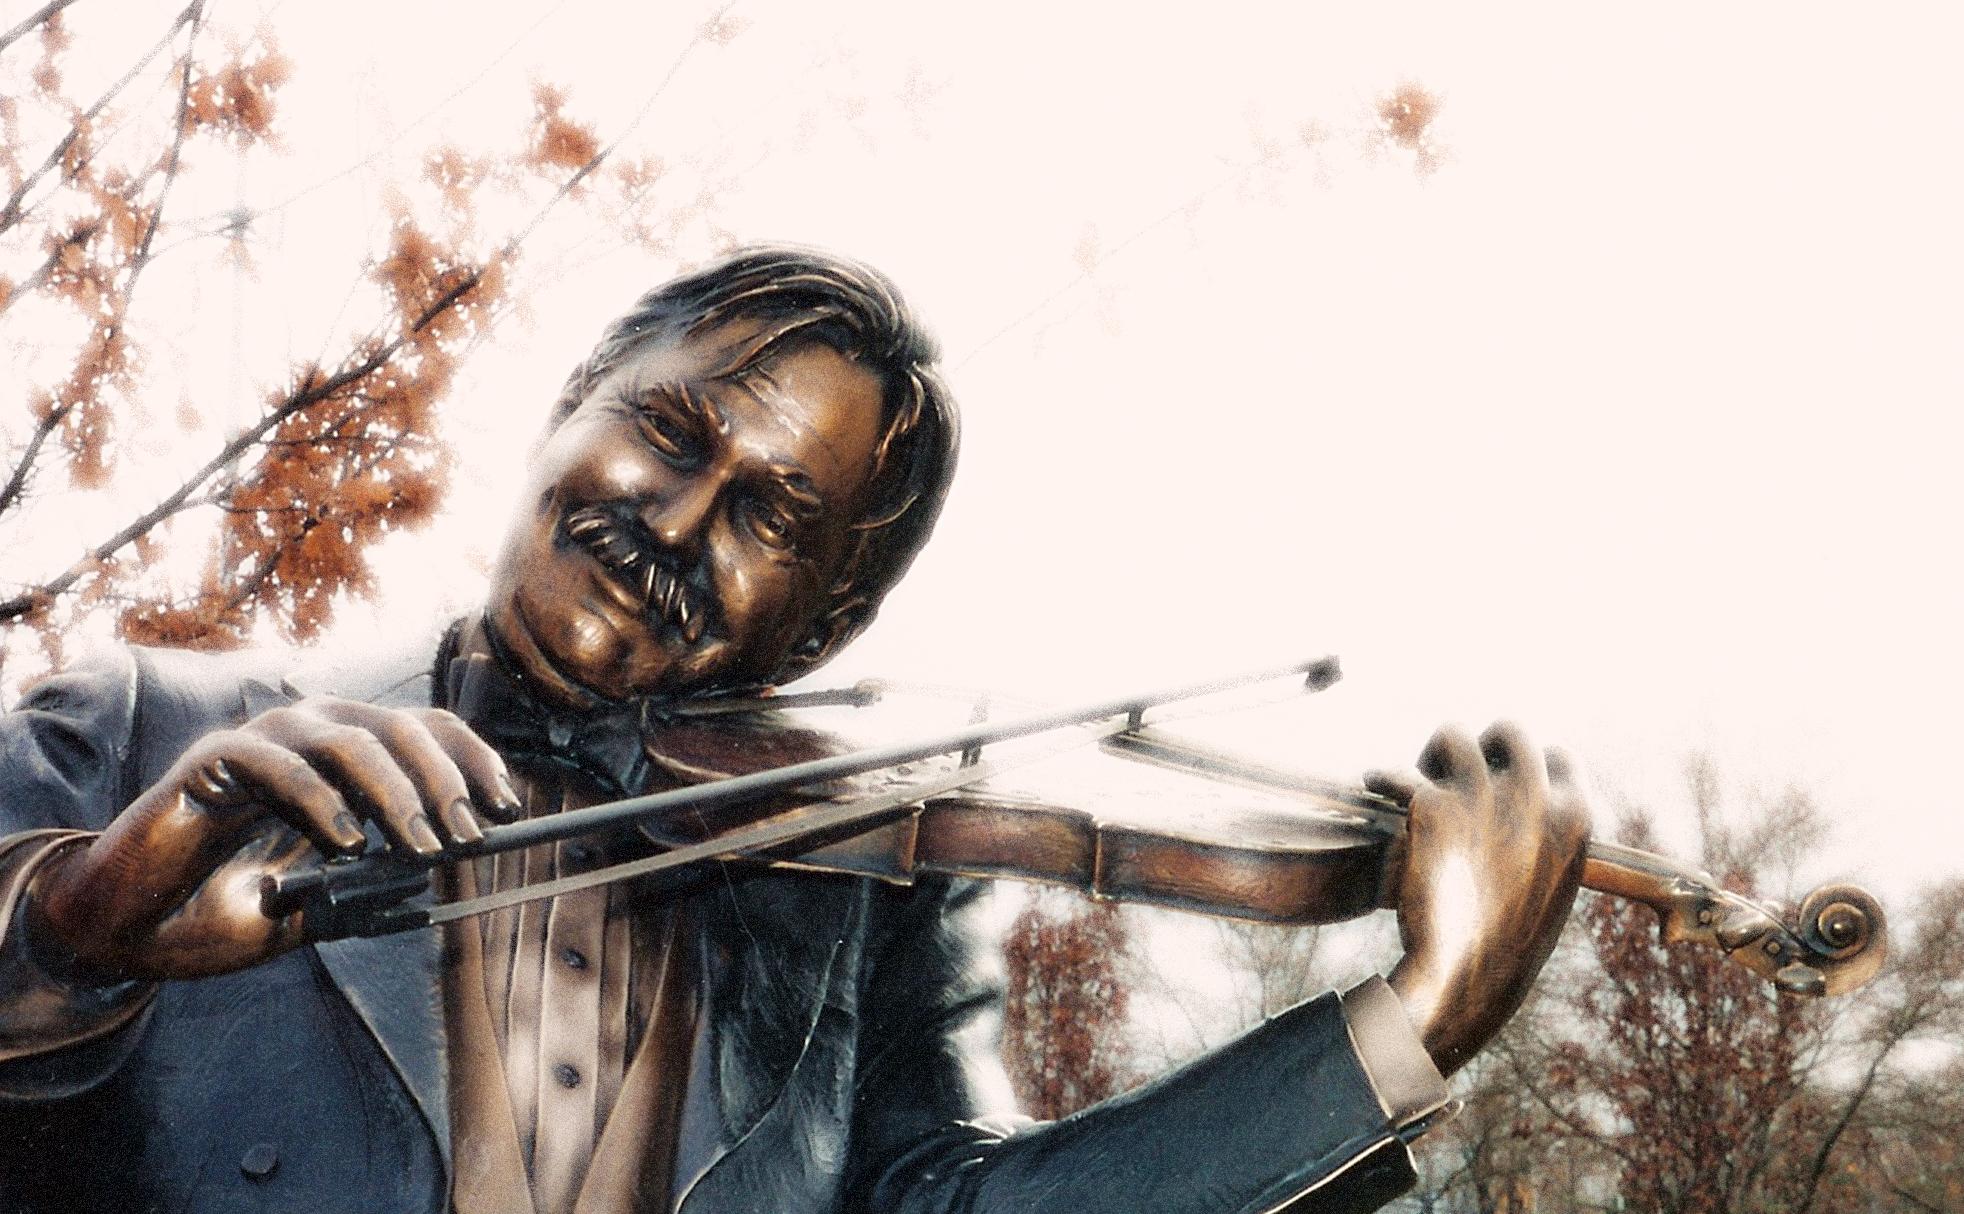 grandpas violin by musicals